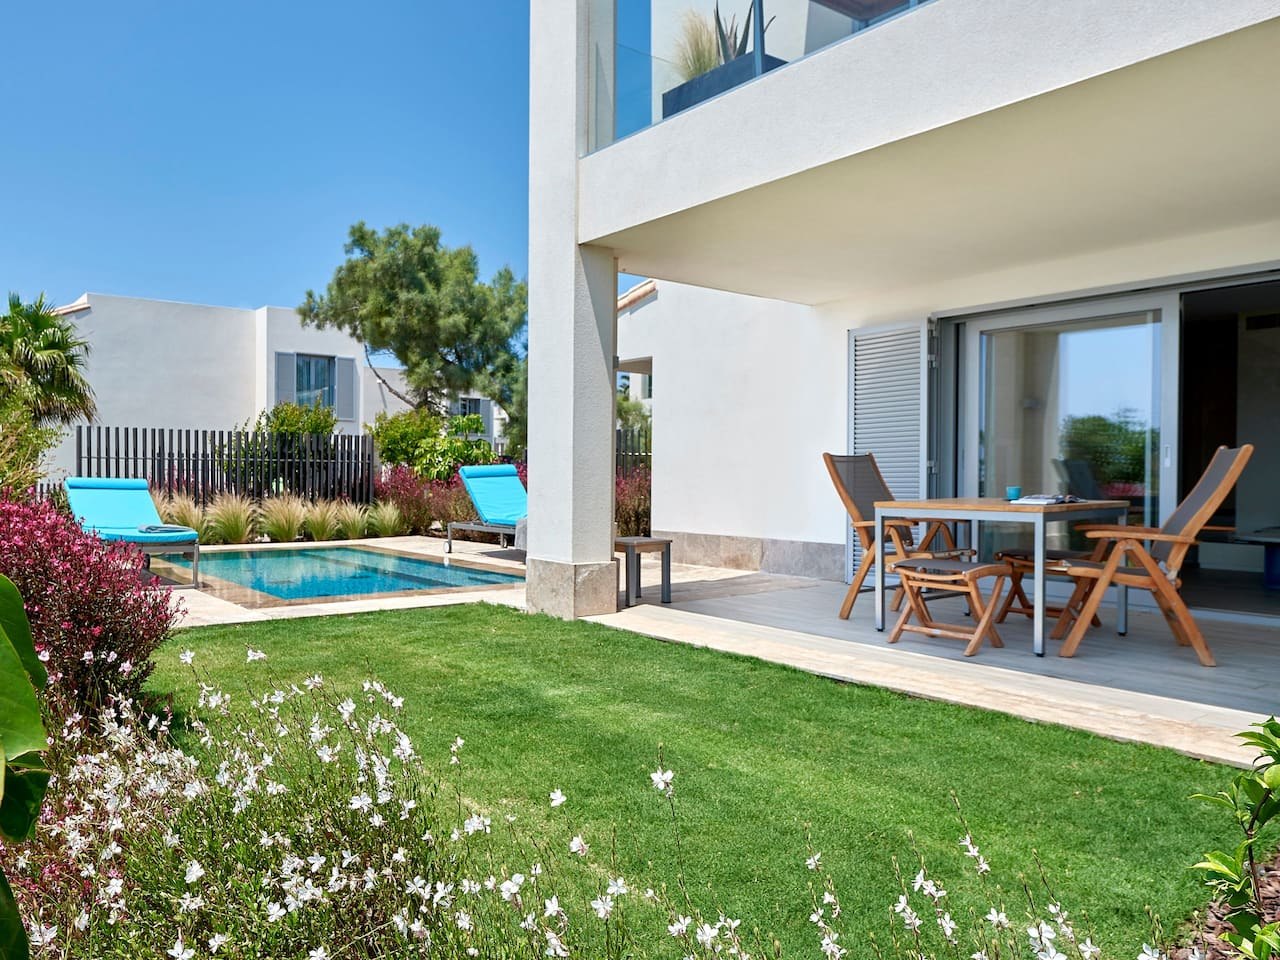 7Pines Ibiza Garden pool